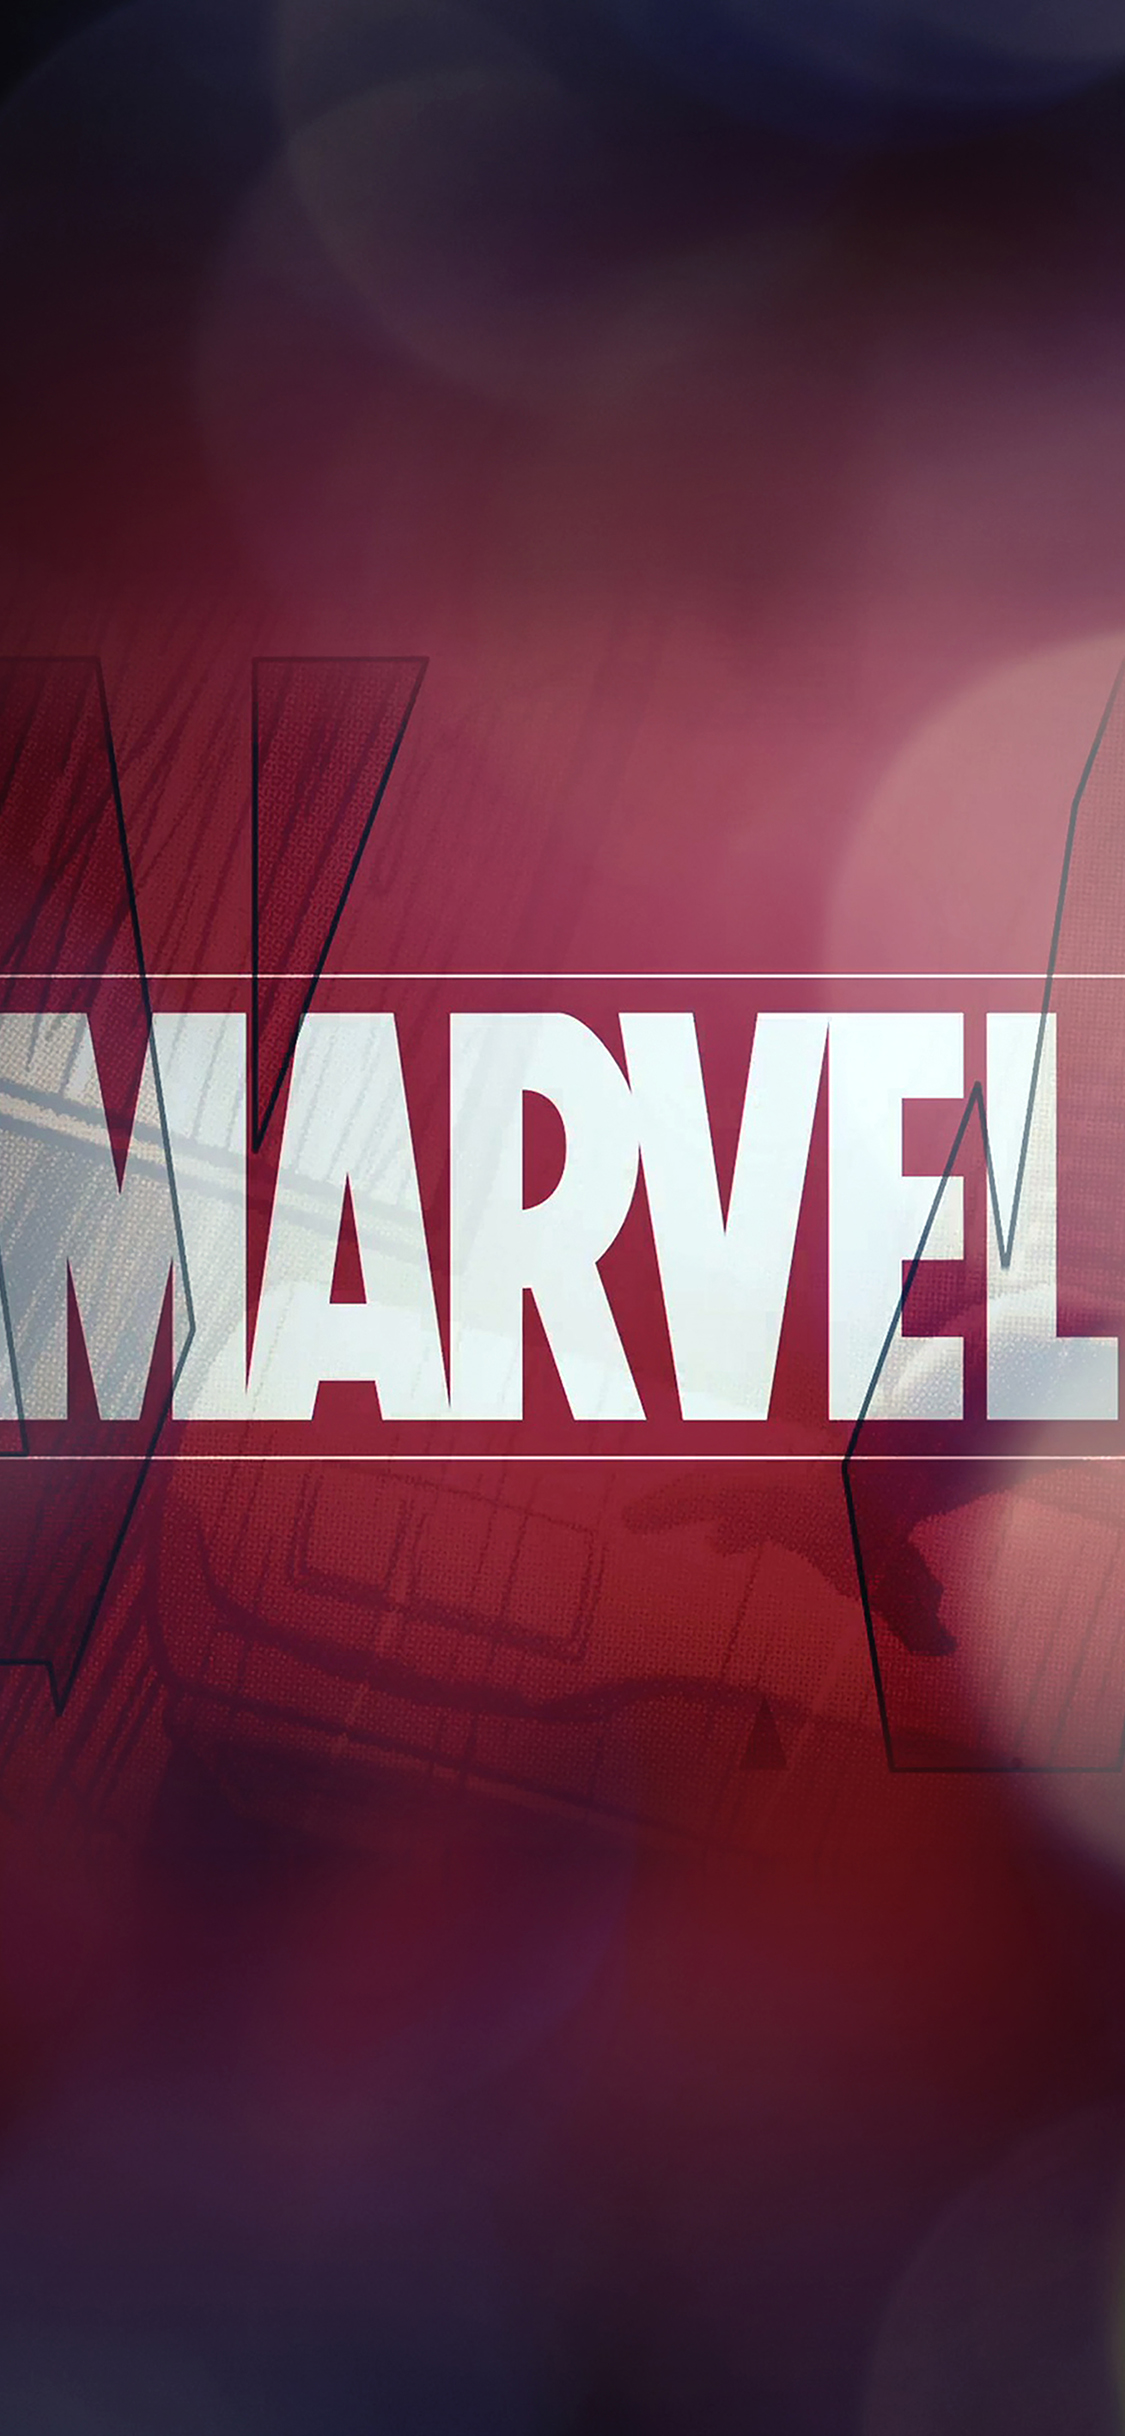 Android Phone Car Wallpapers Ai55 Marvel Logo Film Art Illust Minimal Bokeh Papers Co